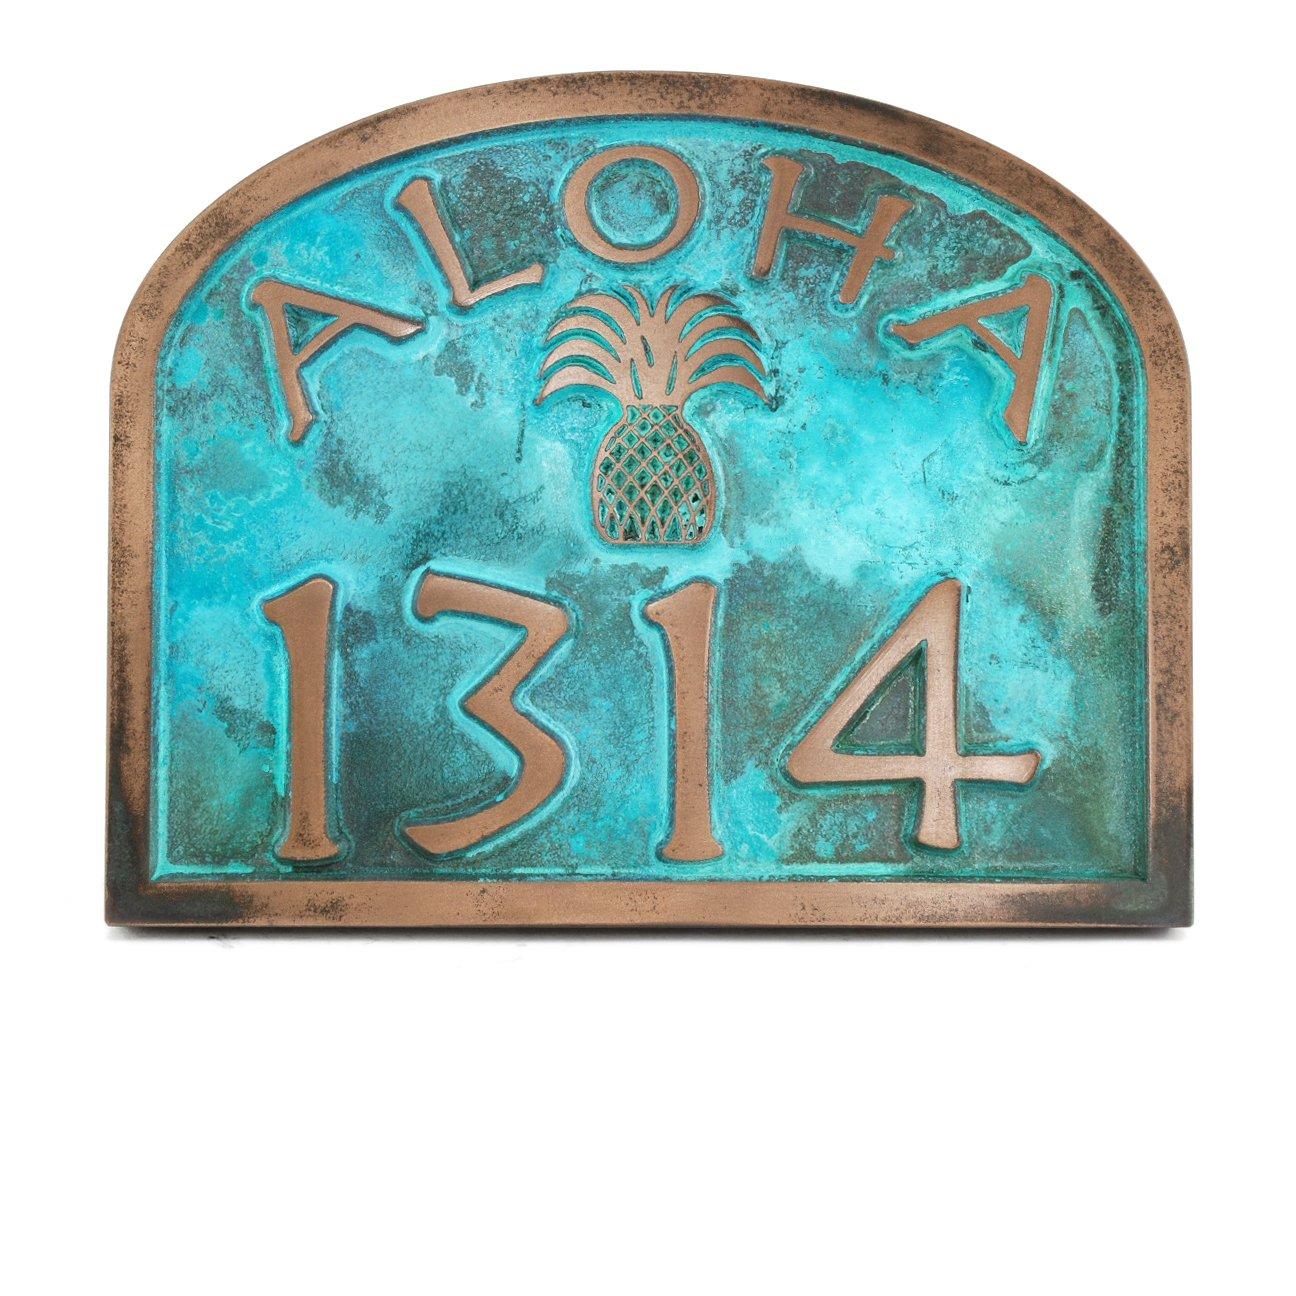 Aloha Address Plaque with Pineapple and Border 12x9.5 - USA Made - Raised Bronze Verdi Coated